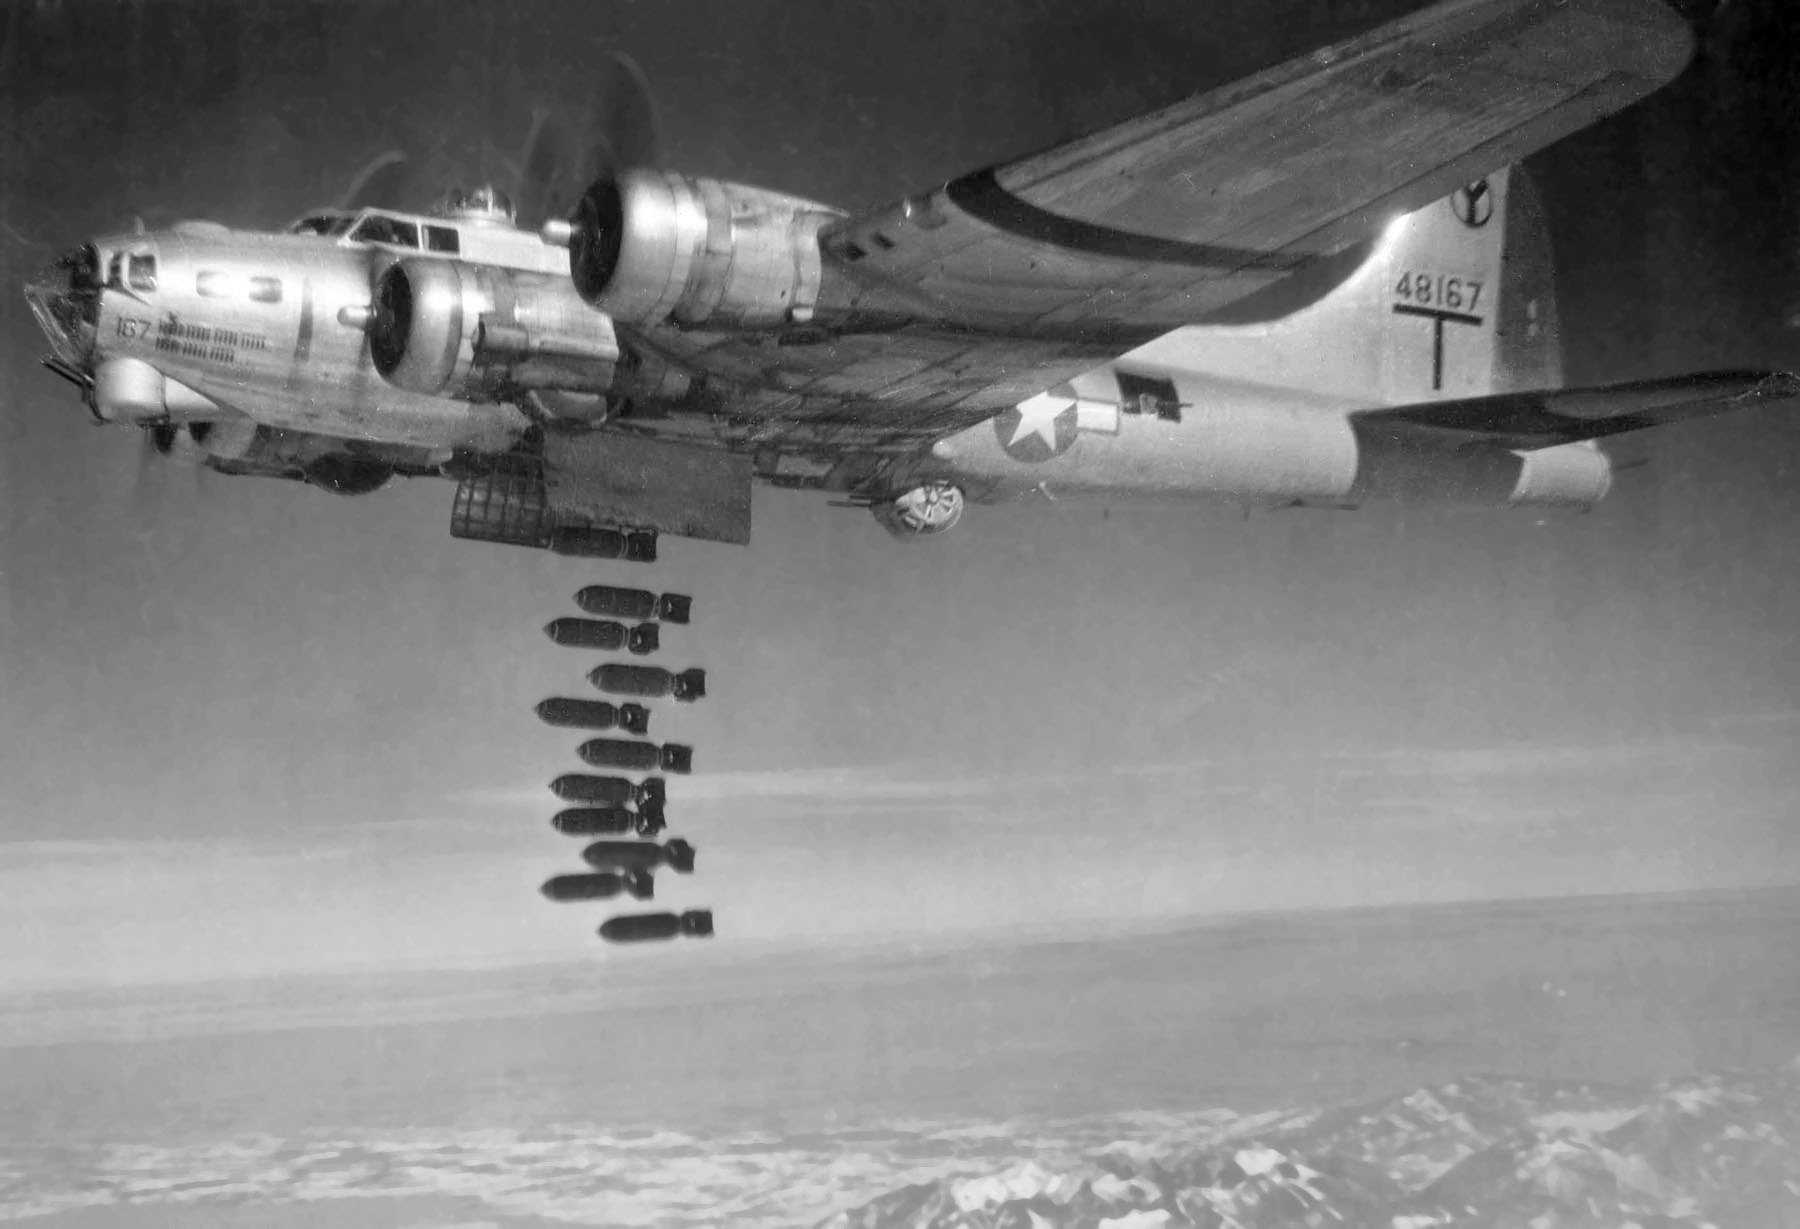 File:Boeing B-17G 2 BG dropping bombs.jpg - Wikipedia